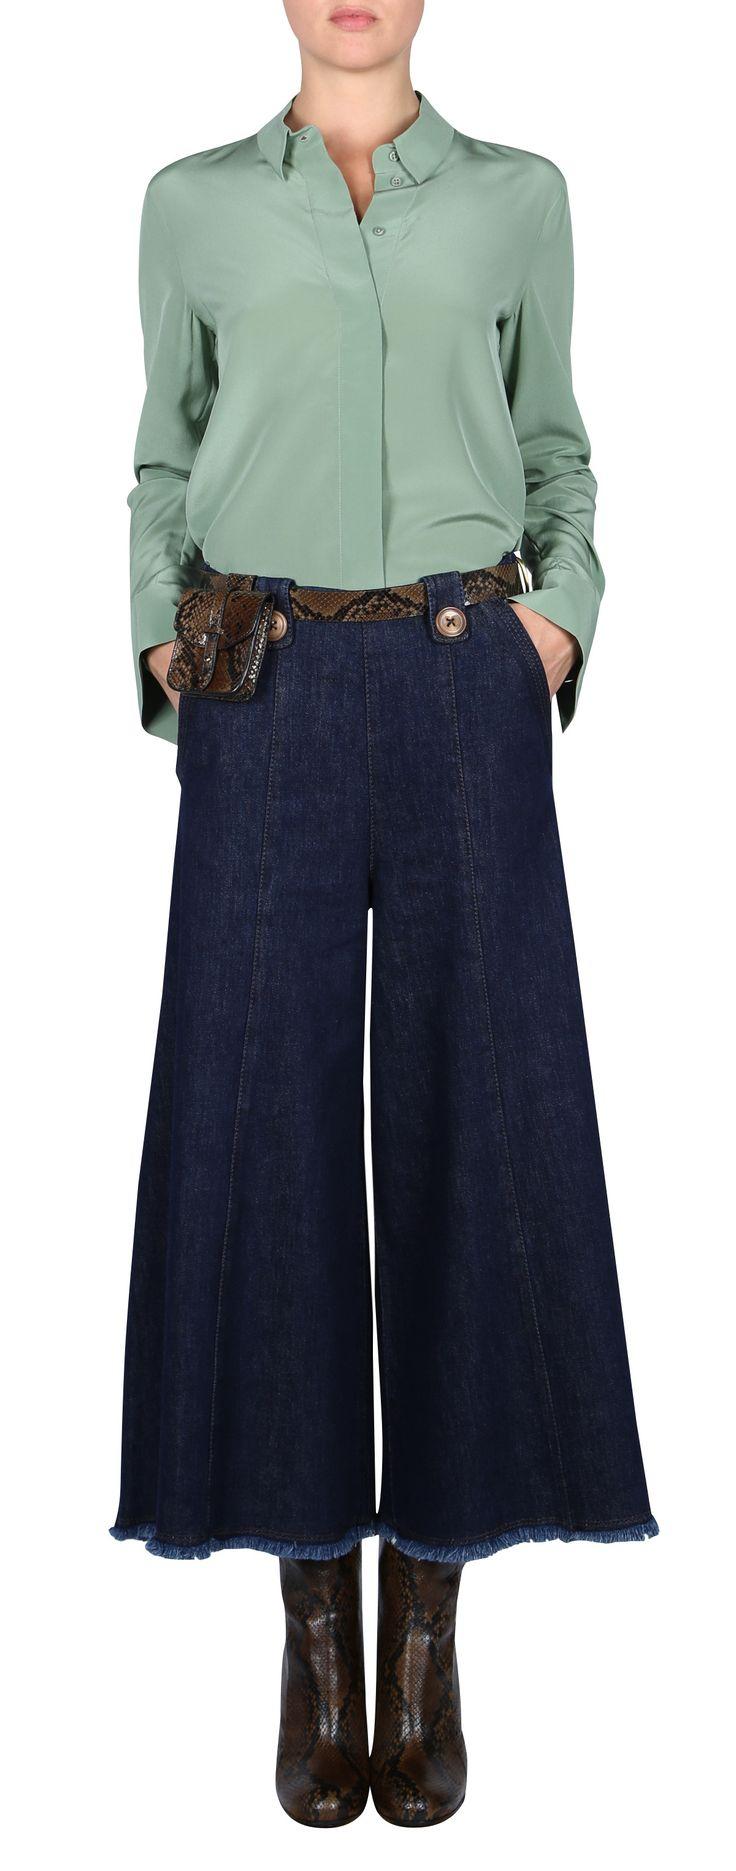 FLIRTY MOVEMENT blouse 1/1 - Bluse - Langarm: grün, Seide, Basic